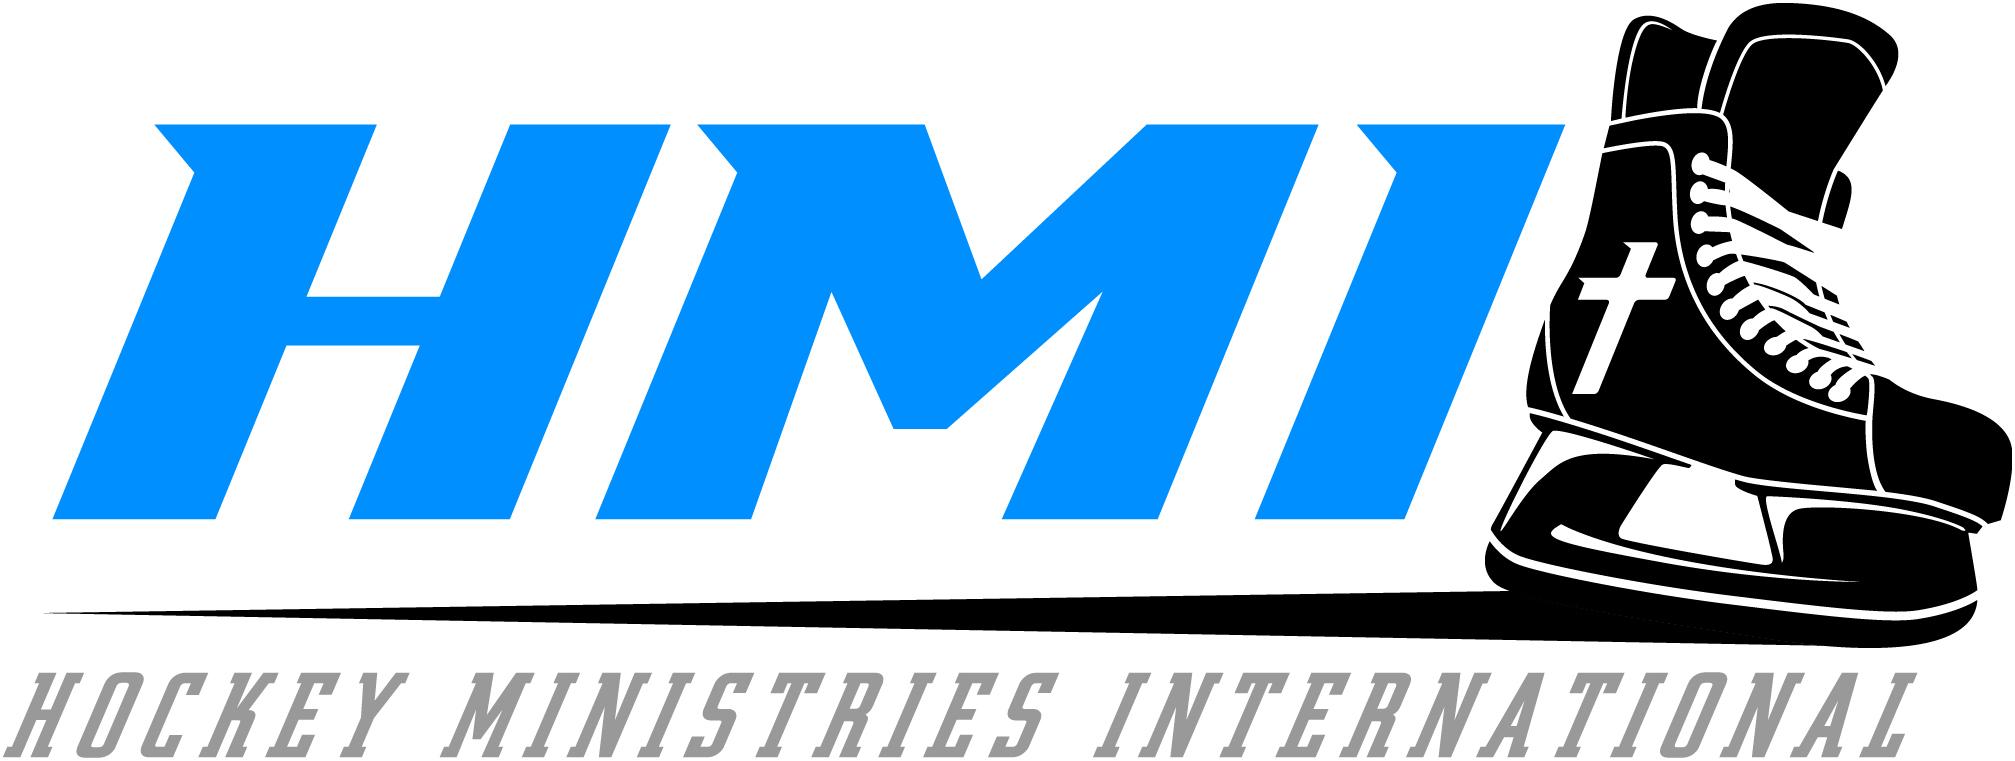 Hockey Ministries